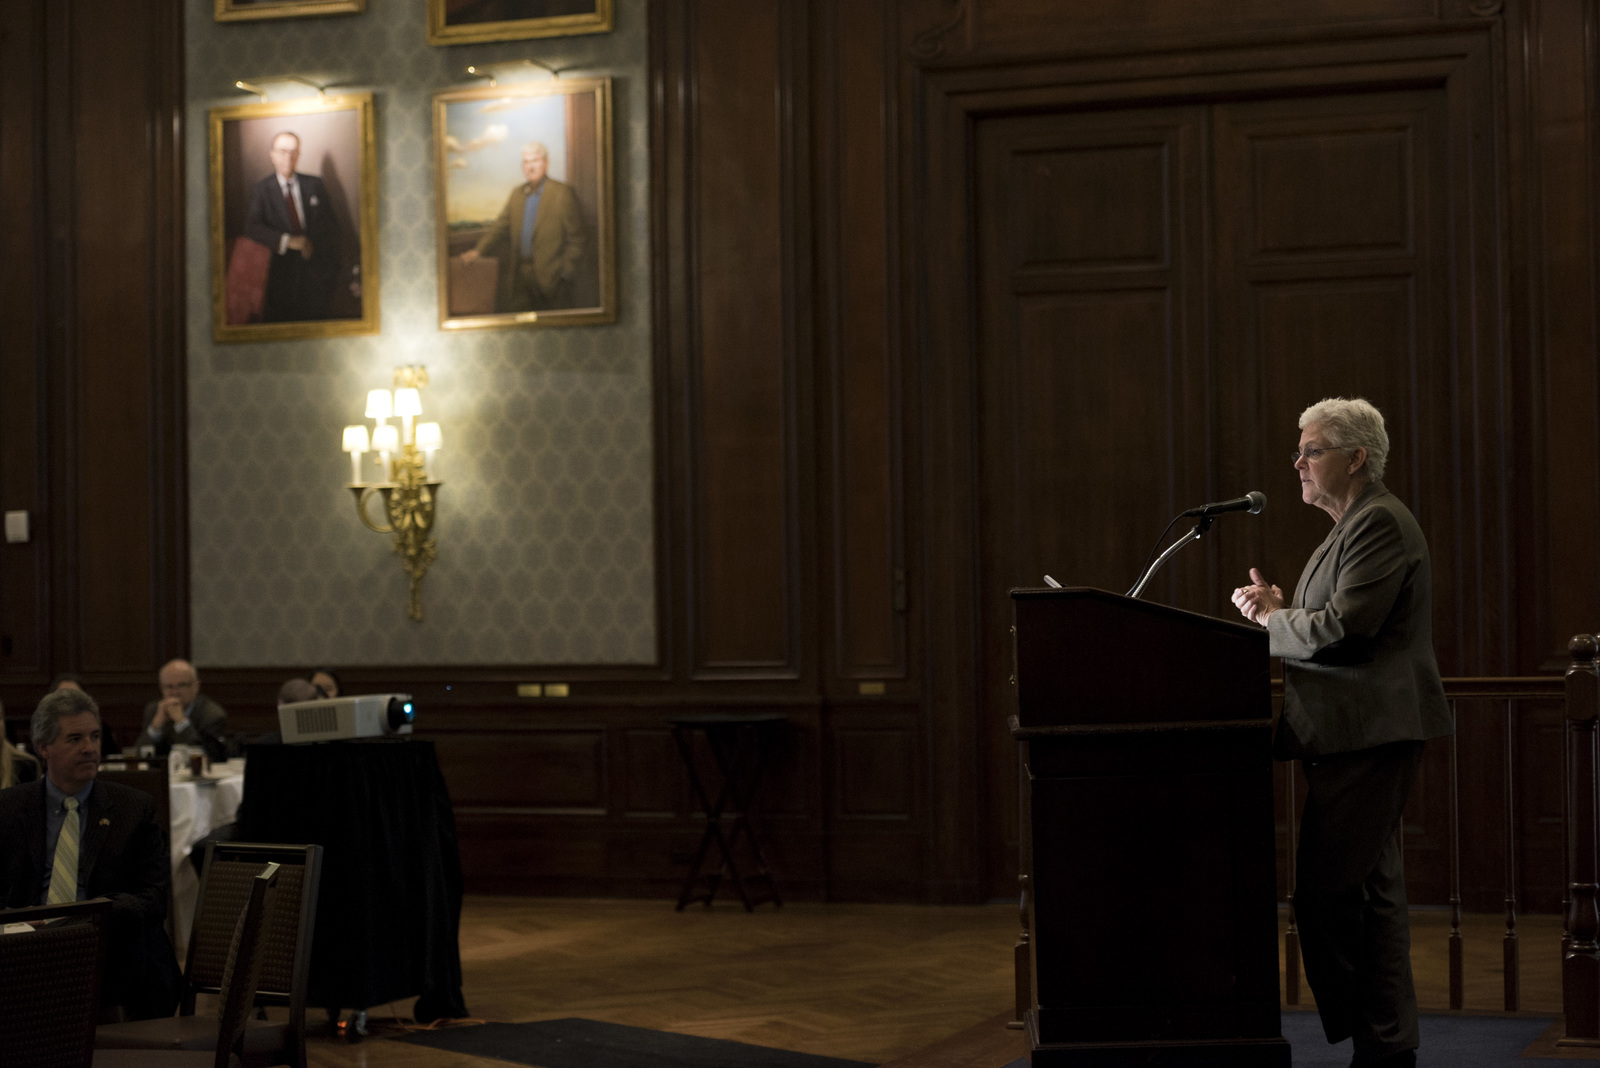 Office of the Administrator - Philadelphia - Administrator Gina McCarthy visiting the Food Lab at Drexel University [412-APD-1265-2014-11-14_Philadelphia_034.jpg]